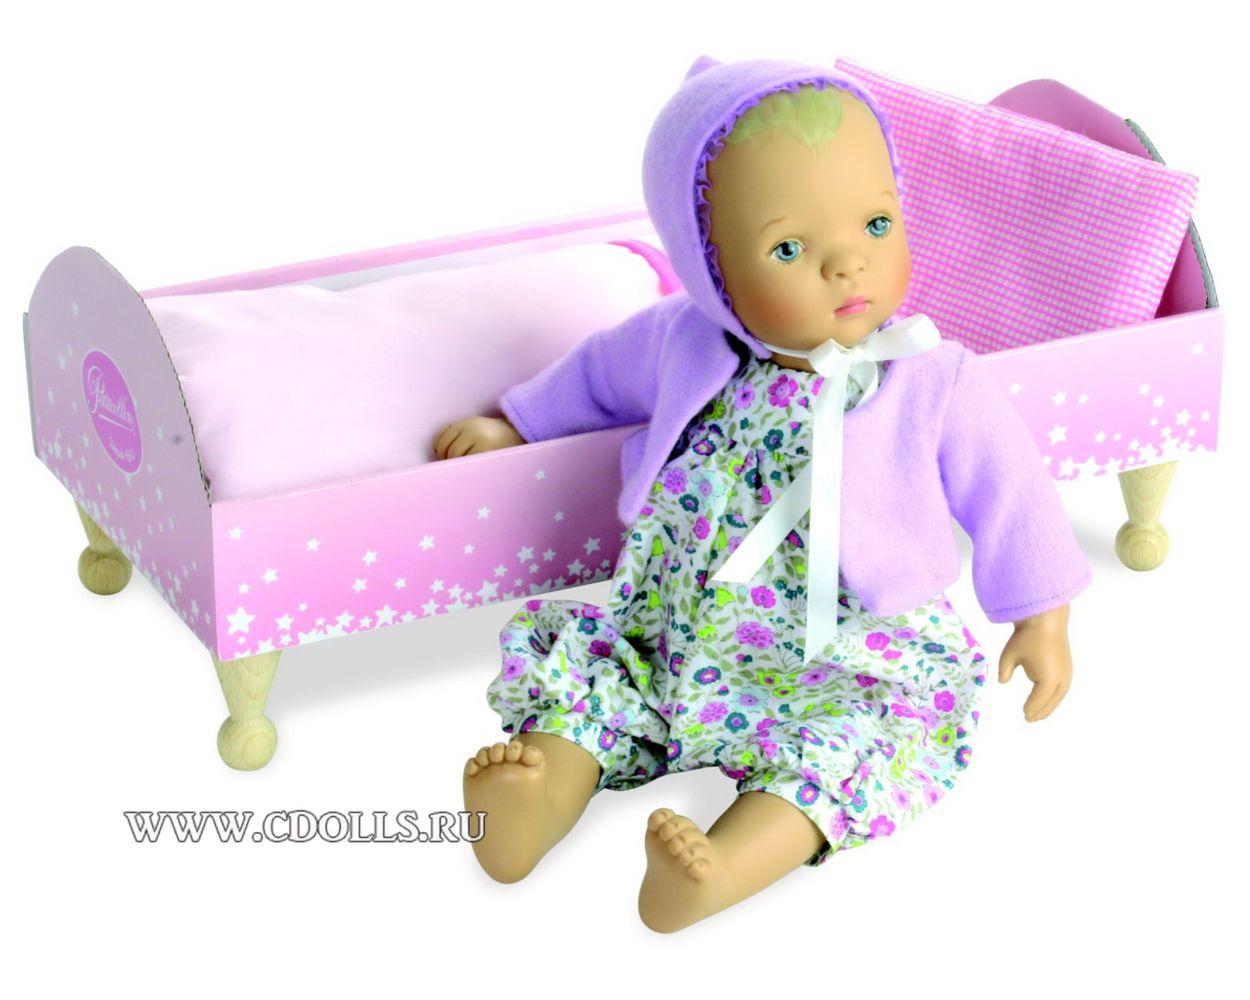 https://cdolls.ru/kukla-baby-doll-bibichou-fleur-in-his-bed-petitkolin-bibishu-fljor-v-krovatke.html